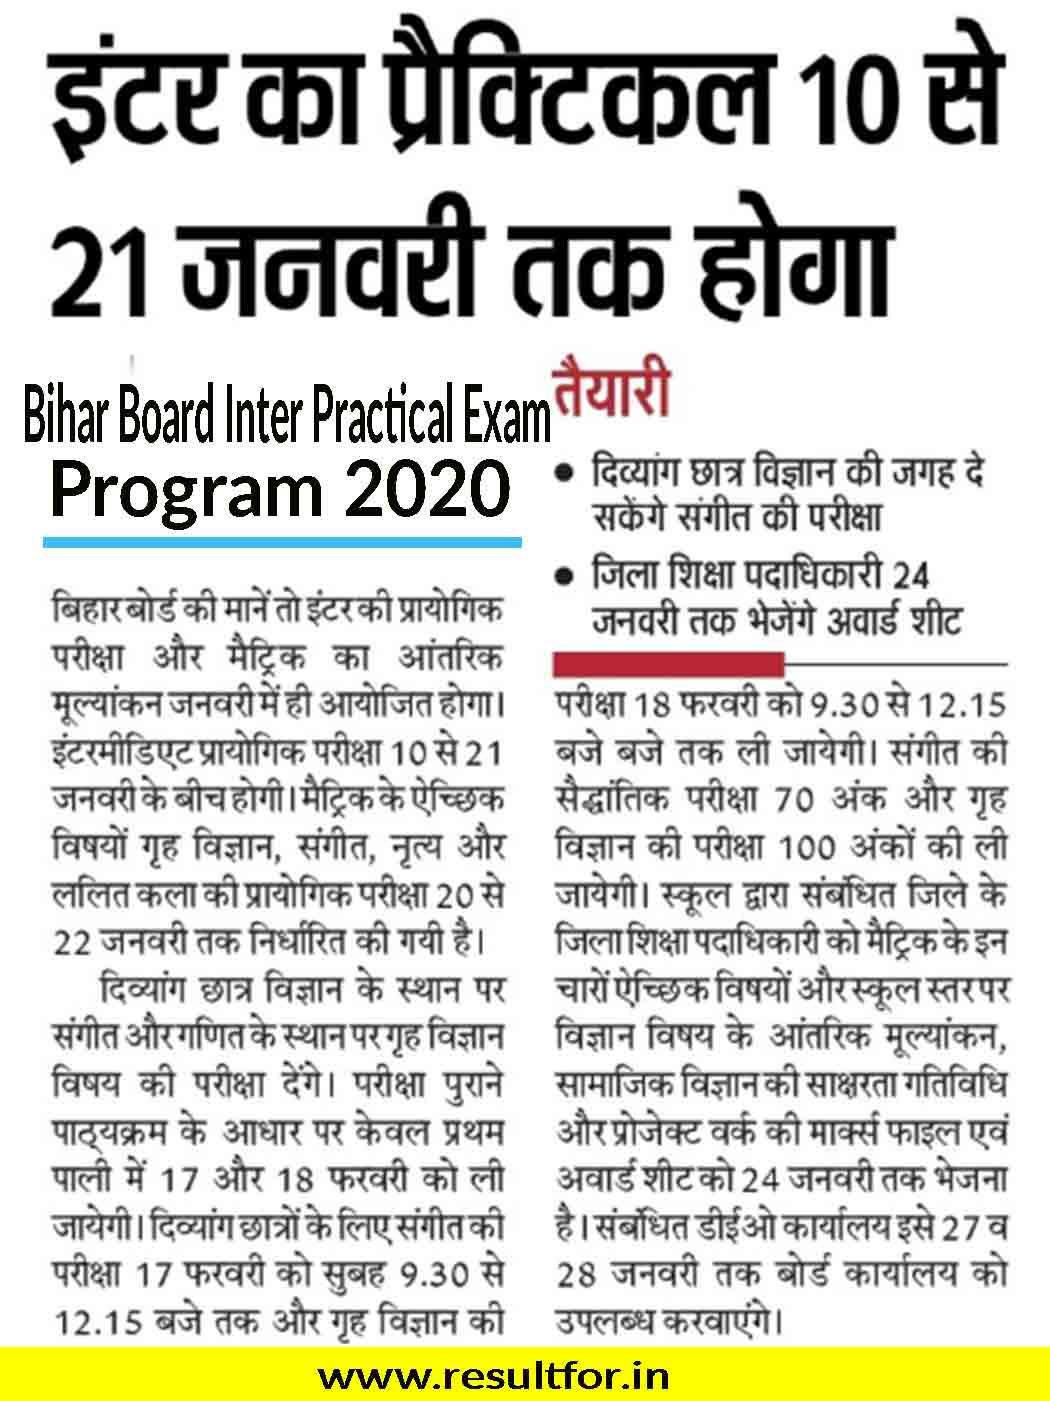 Bihar Board Inter Practical Exam Date Sheet 2020. | Bihar Board in Calendar 2020 Bihar Sarkar